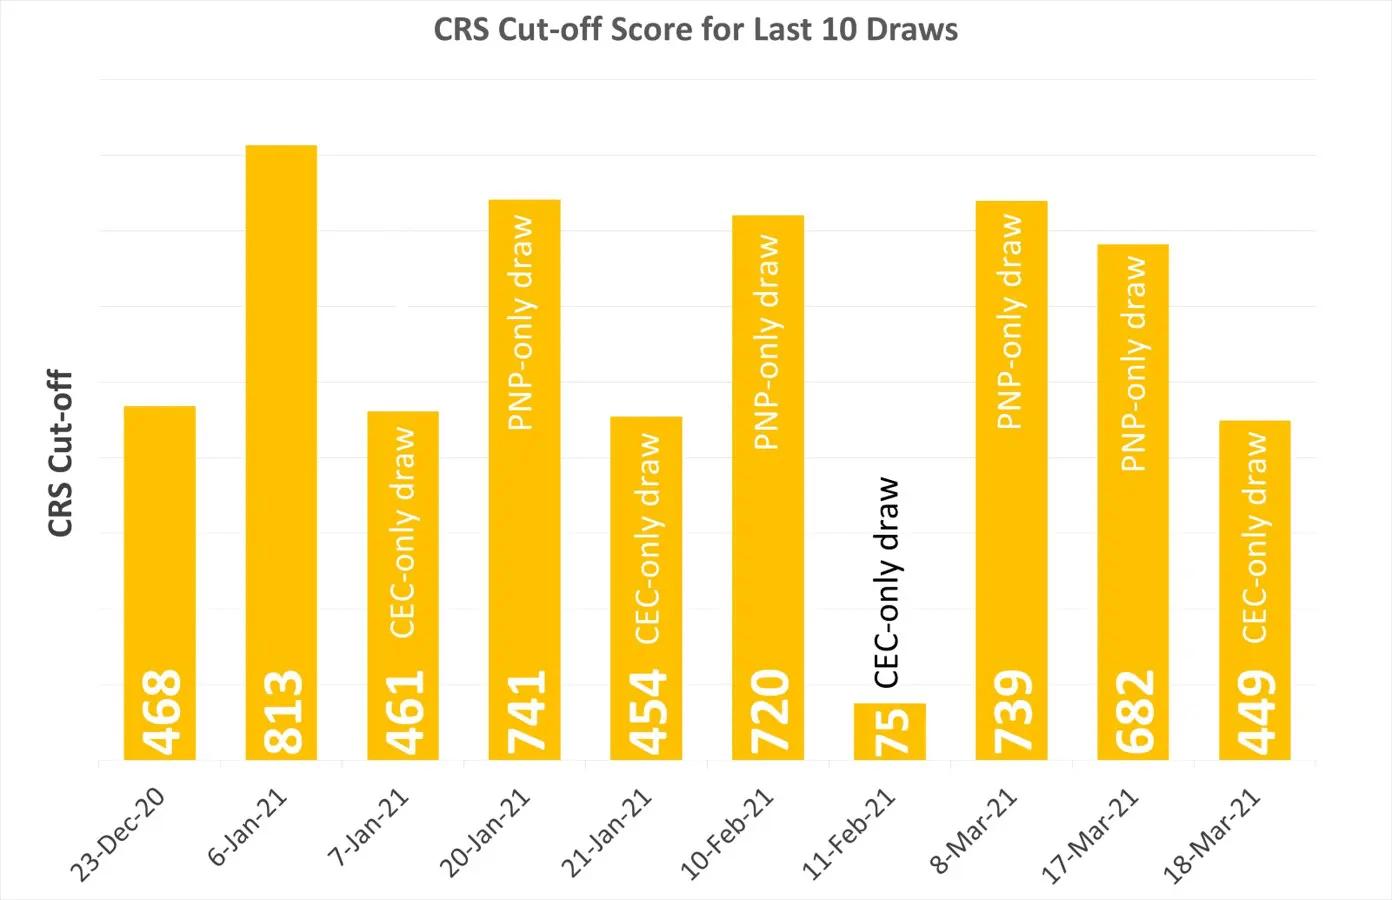 CRS-cut-off-score-for-last-10-draws